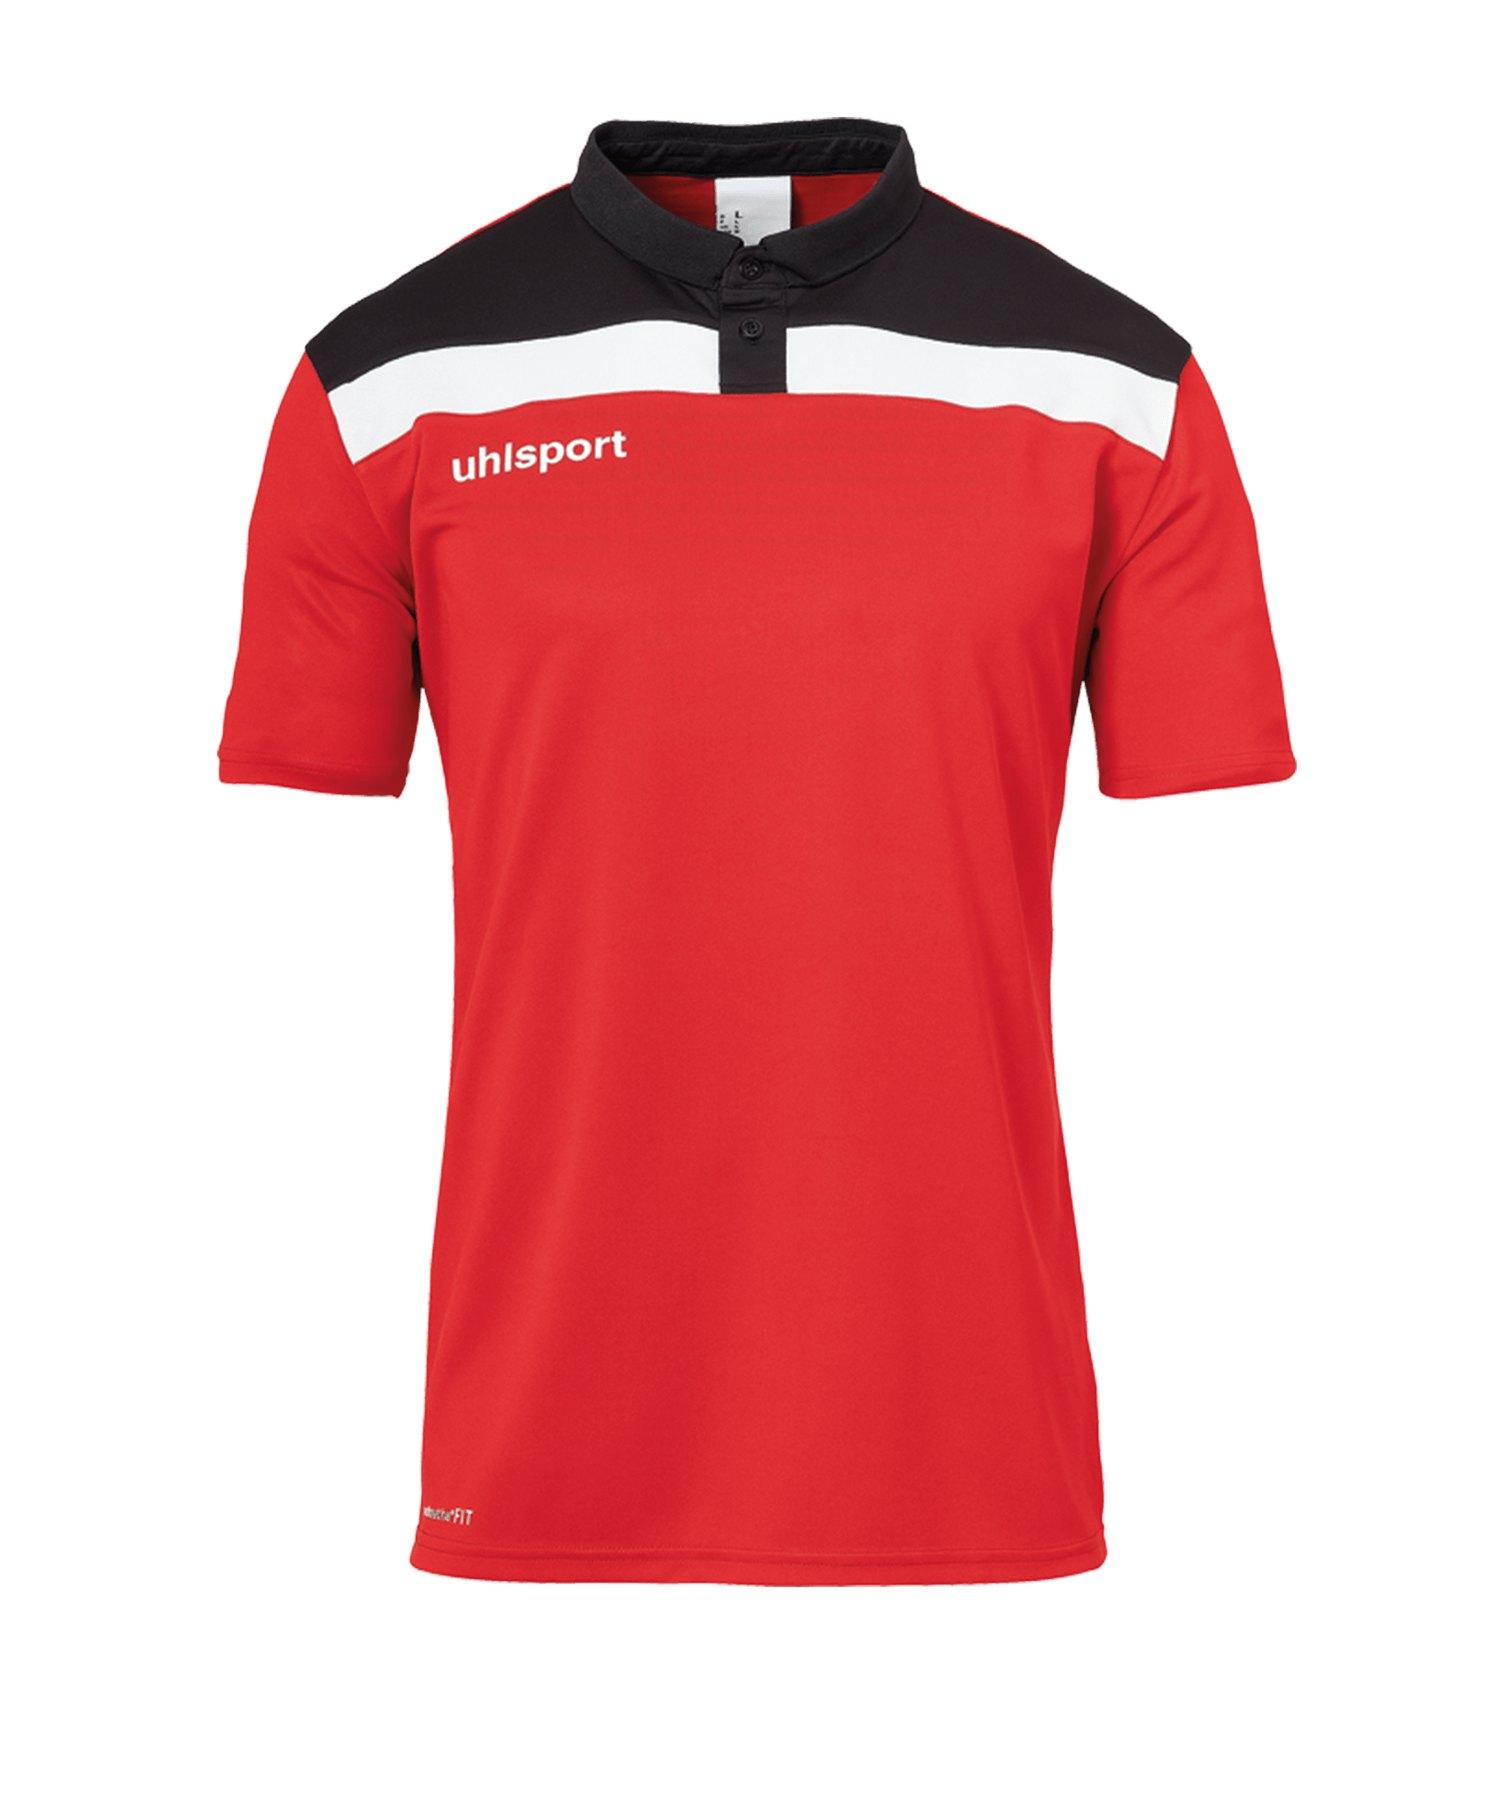 Uhlsport Offense 23 Poloshirt Kids Rot Schwarz F04 - rot